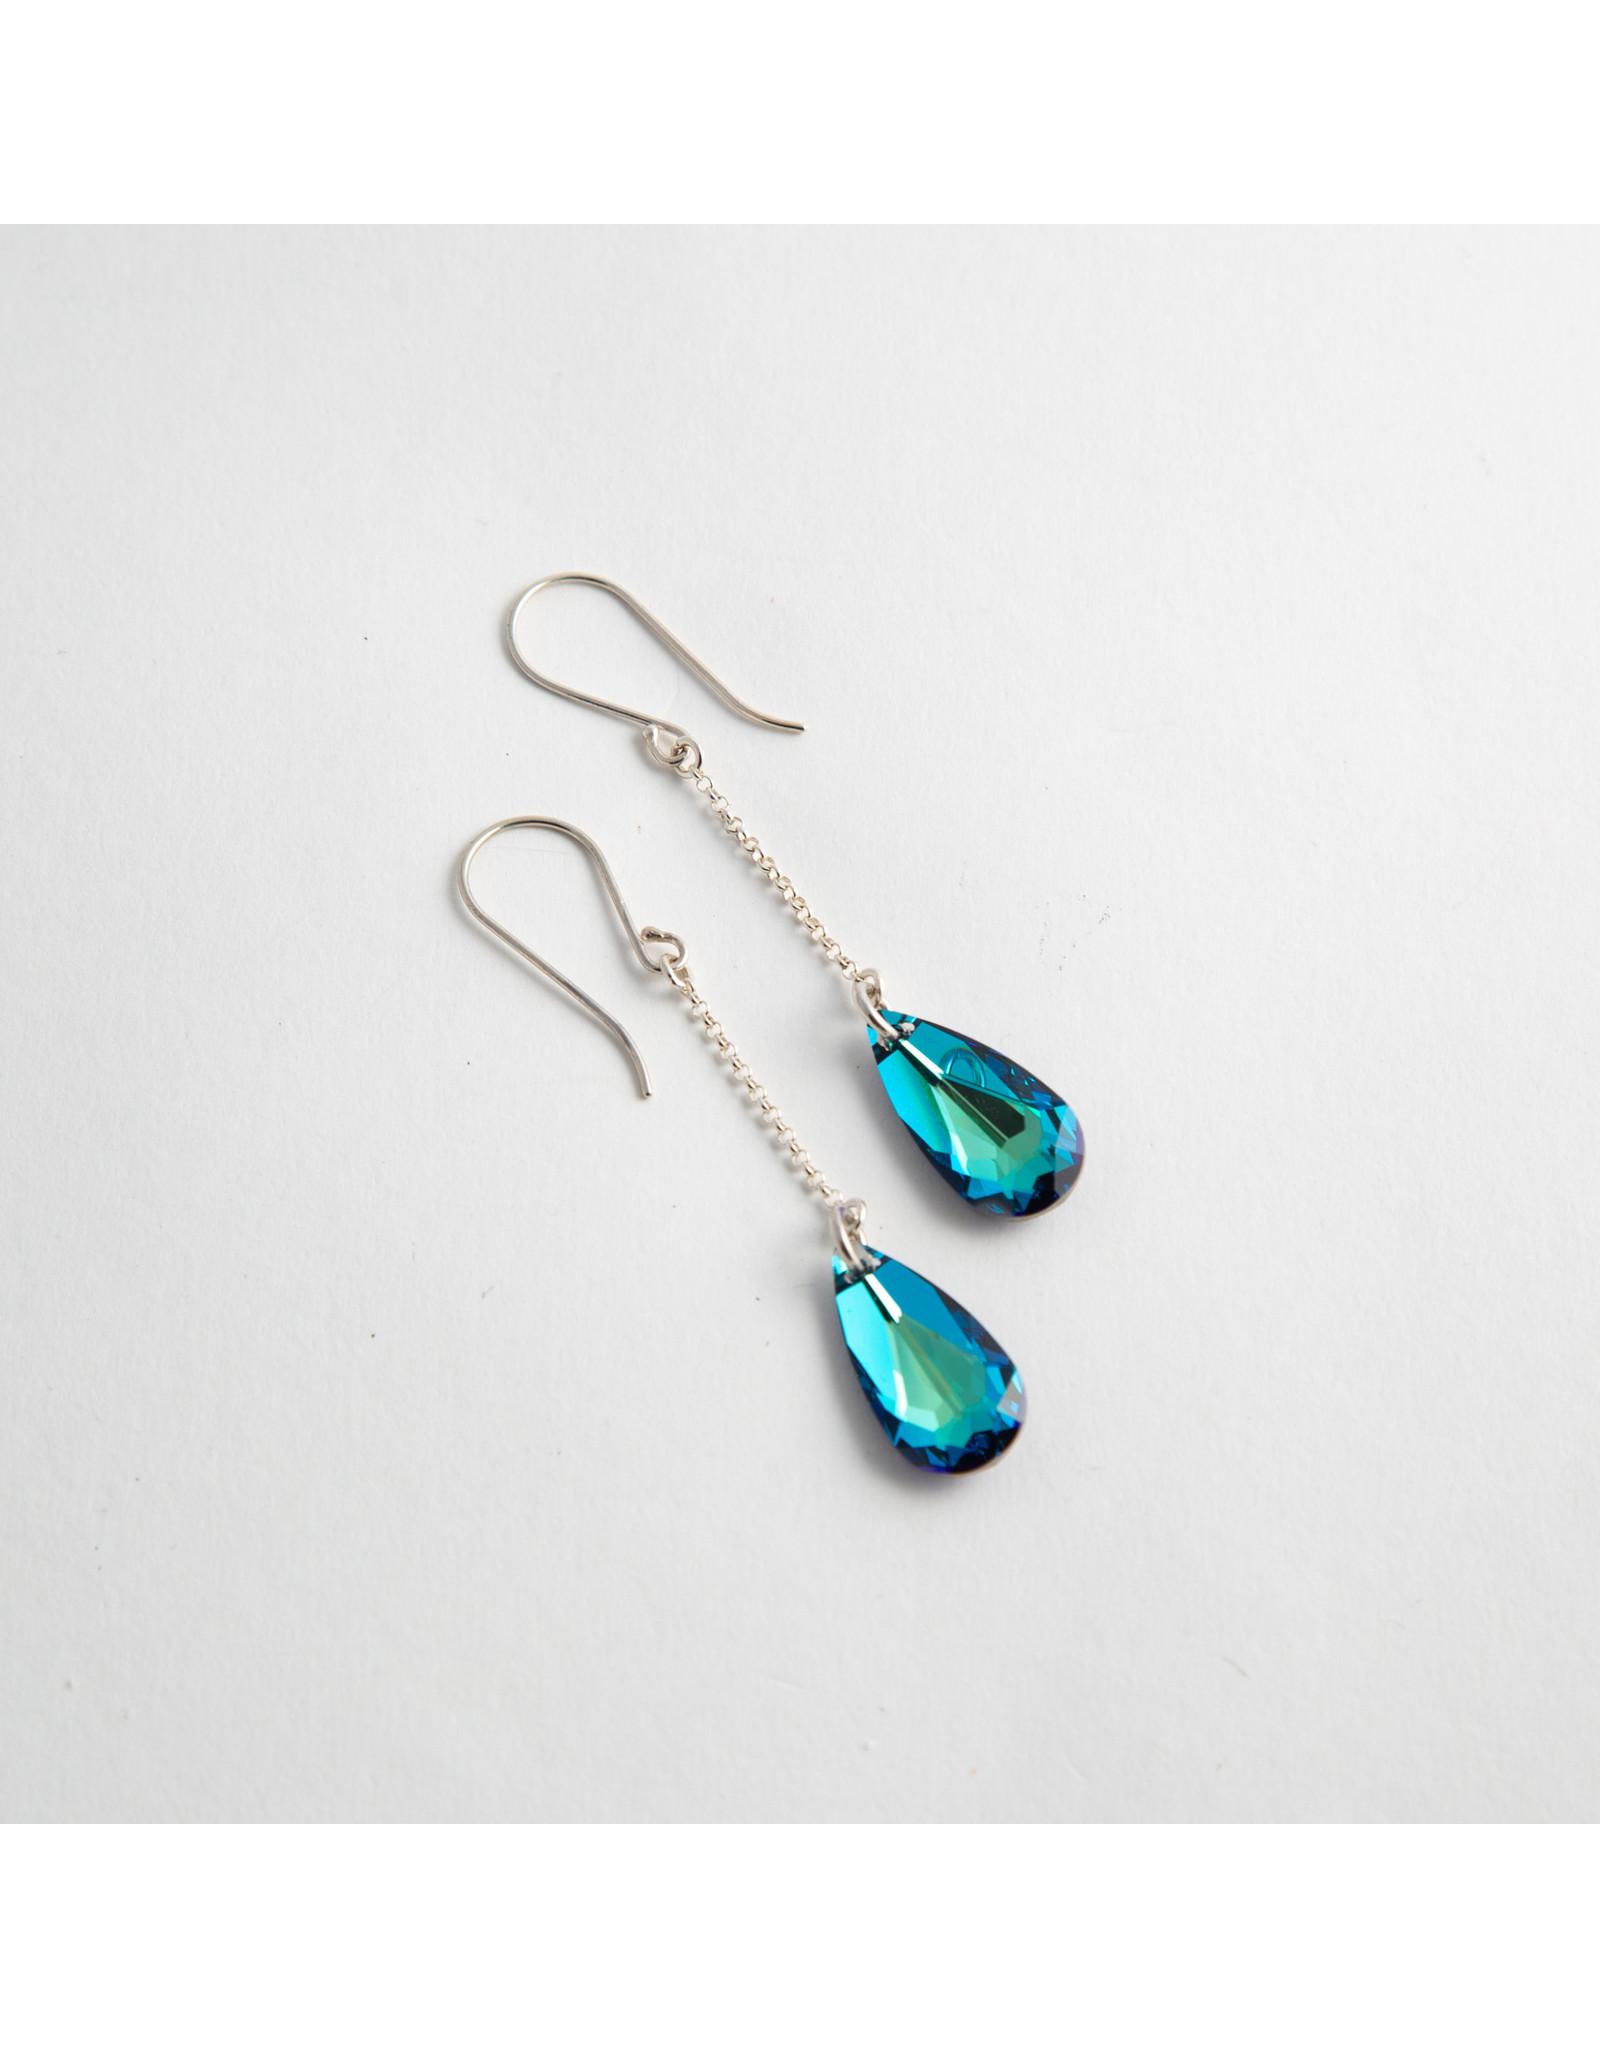 Diablo Organics Diablo Organics Bermuda Blue teardrop Swarovski crystal on 23mm silver chain & hook traditional earrings